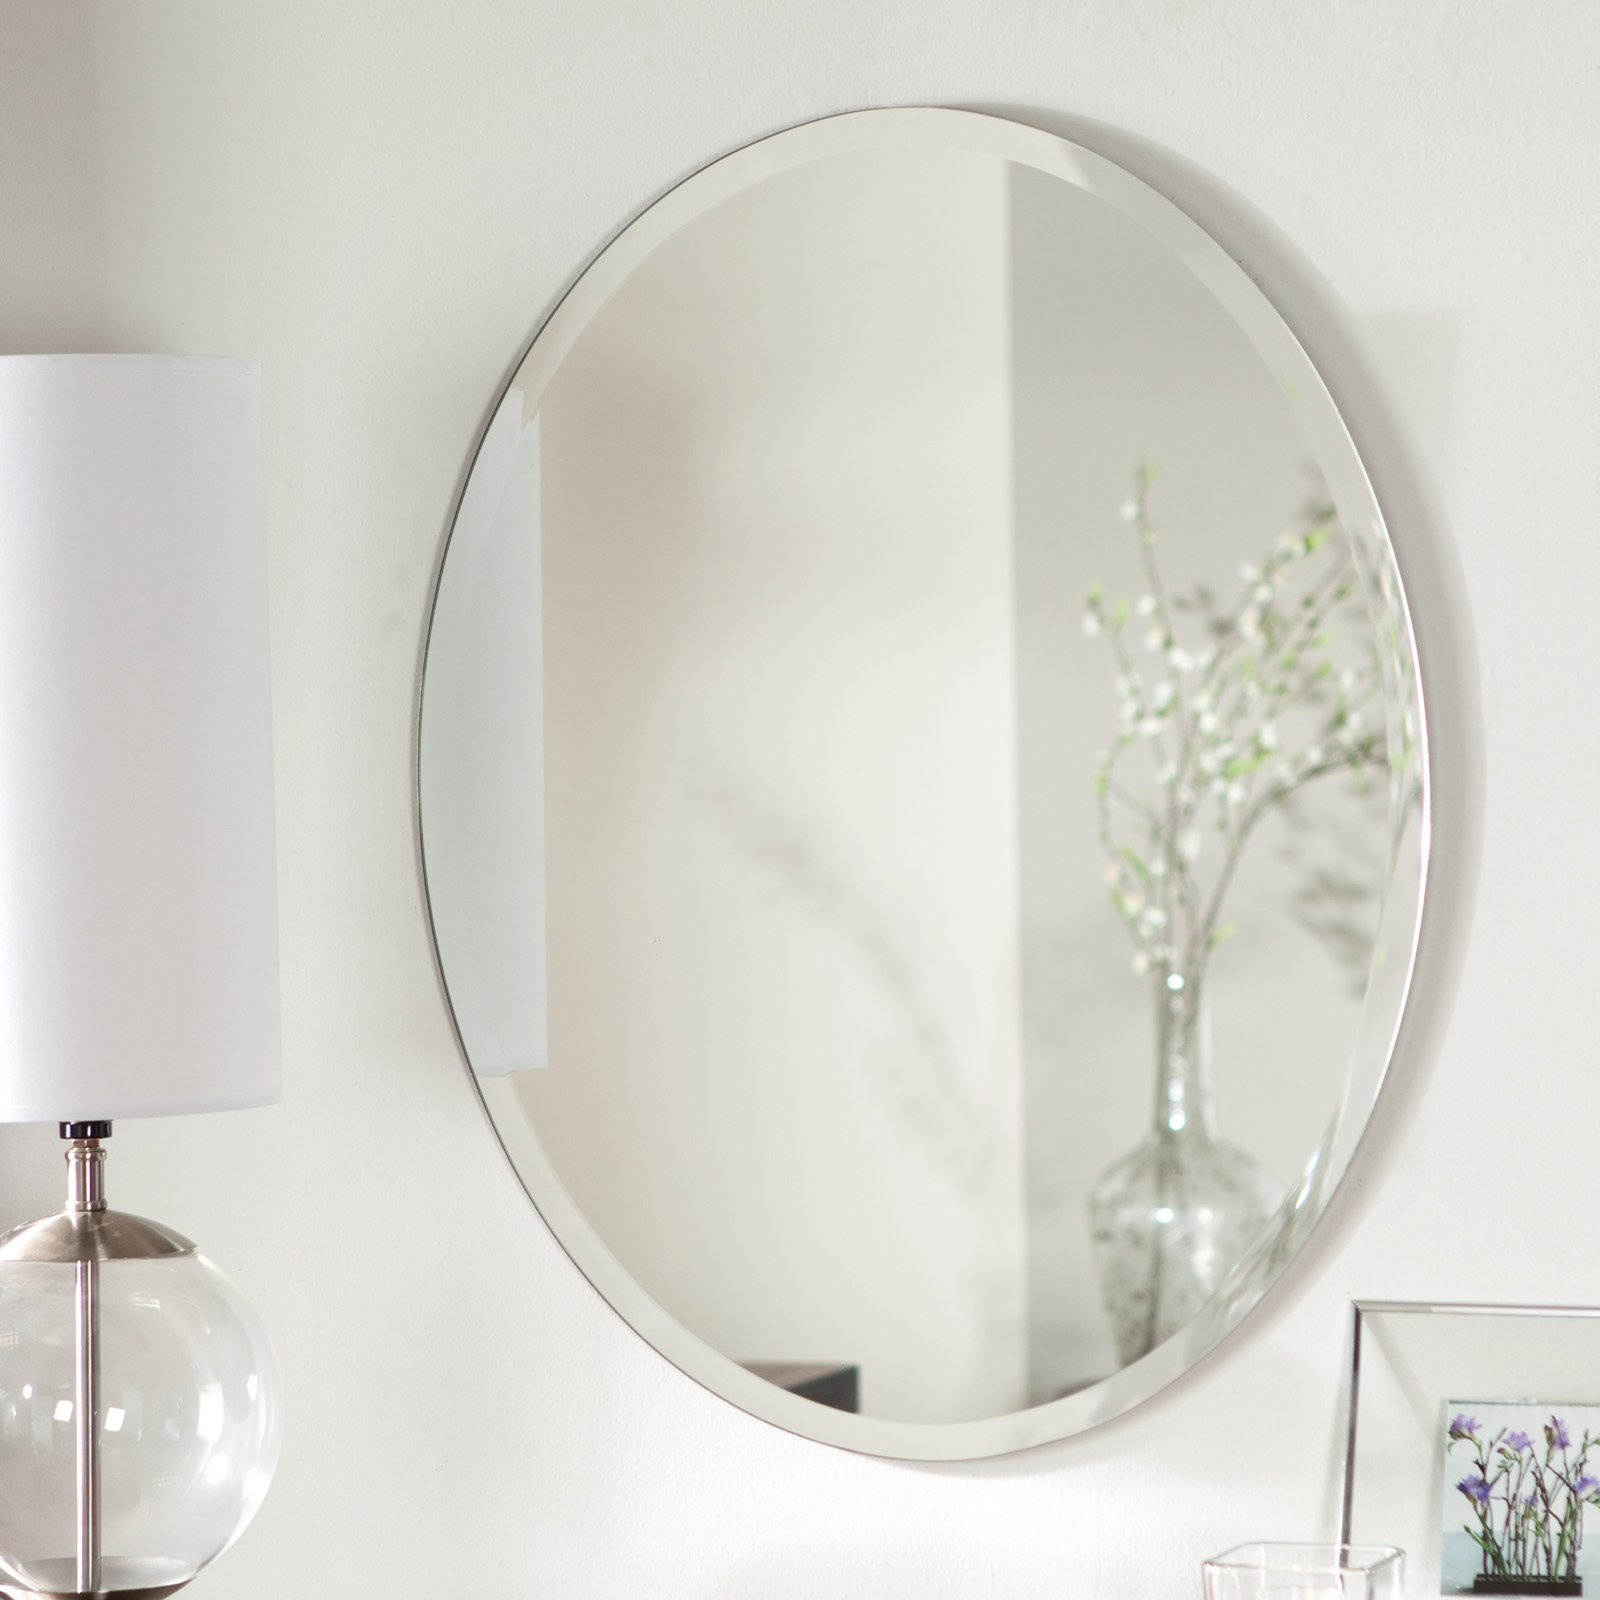 36 x 30 mirror for bathroom - D Cor Wonderland Odelia Oval Bevel Frameless Wall Mirror 22w X 28h In